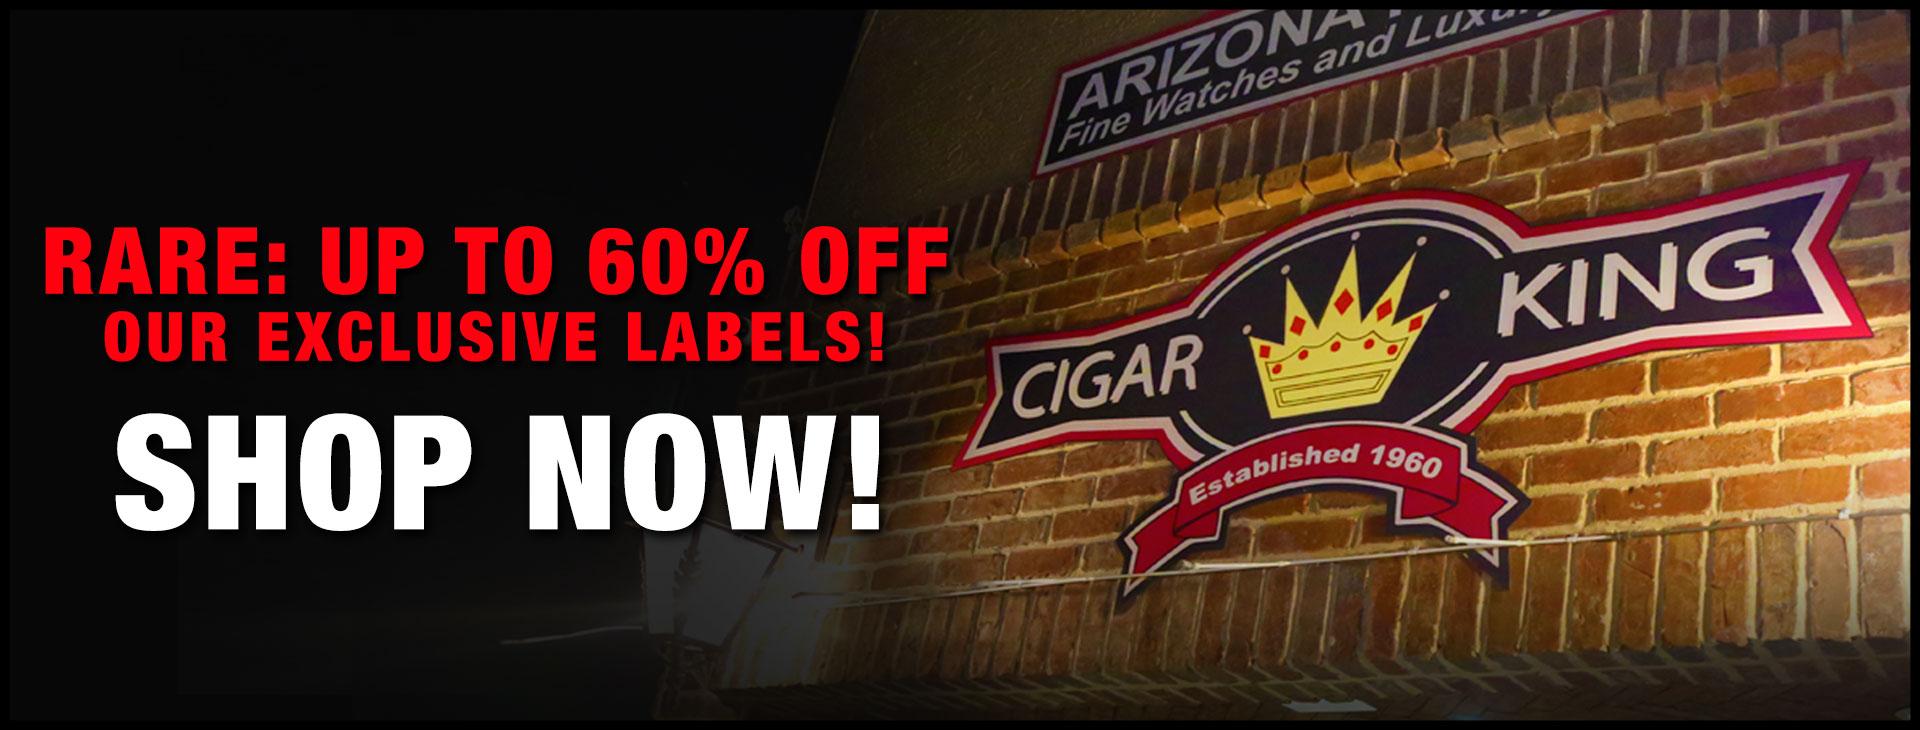 cigar-king-mega-discount-madness-2021-banner.jpg